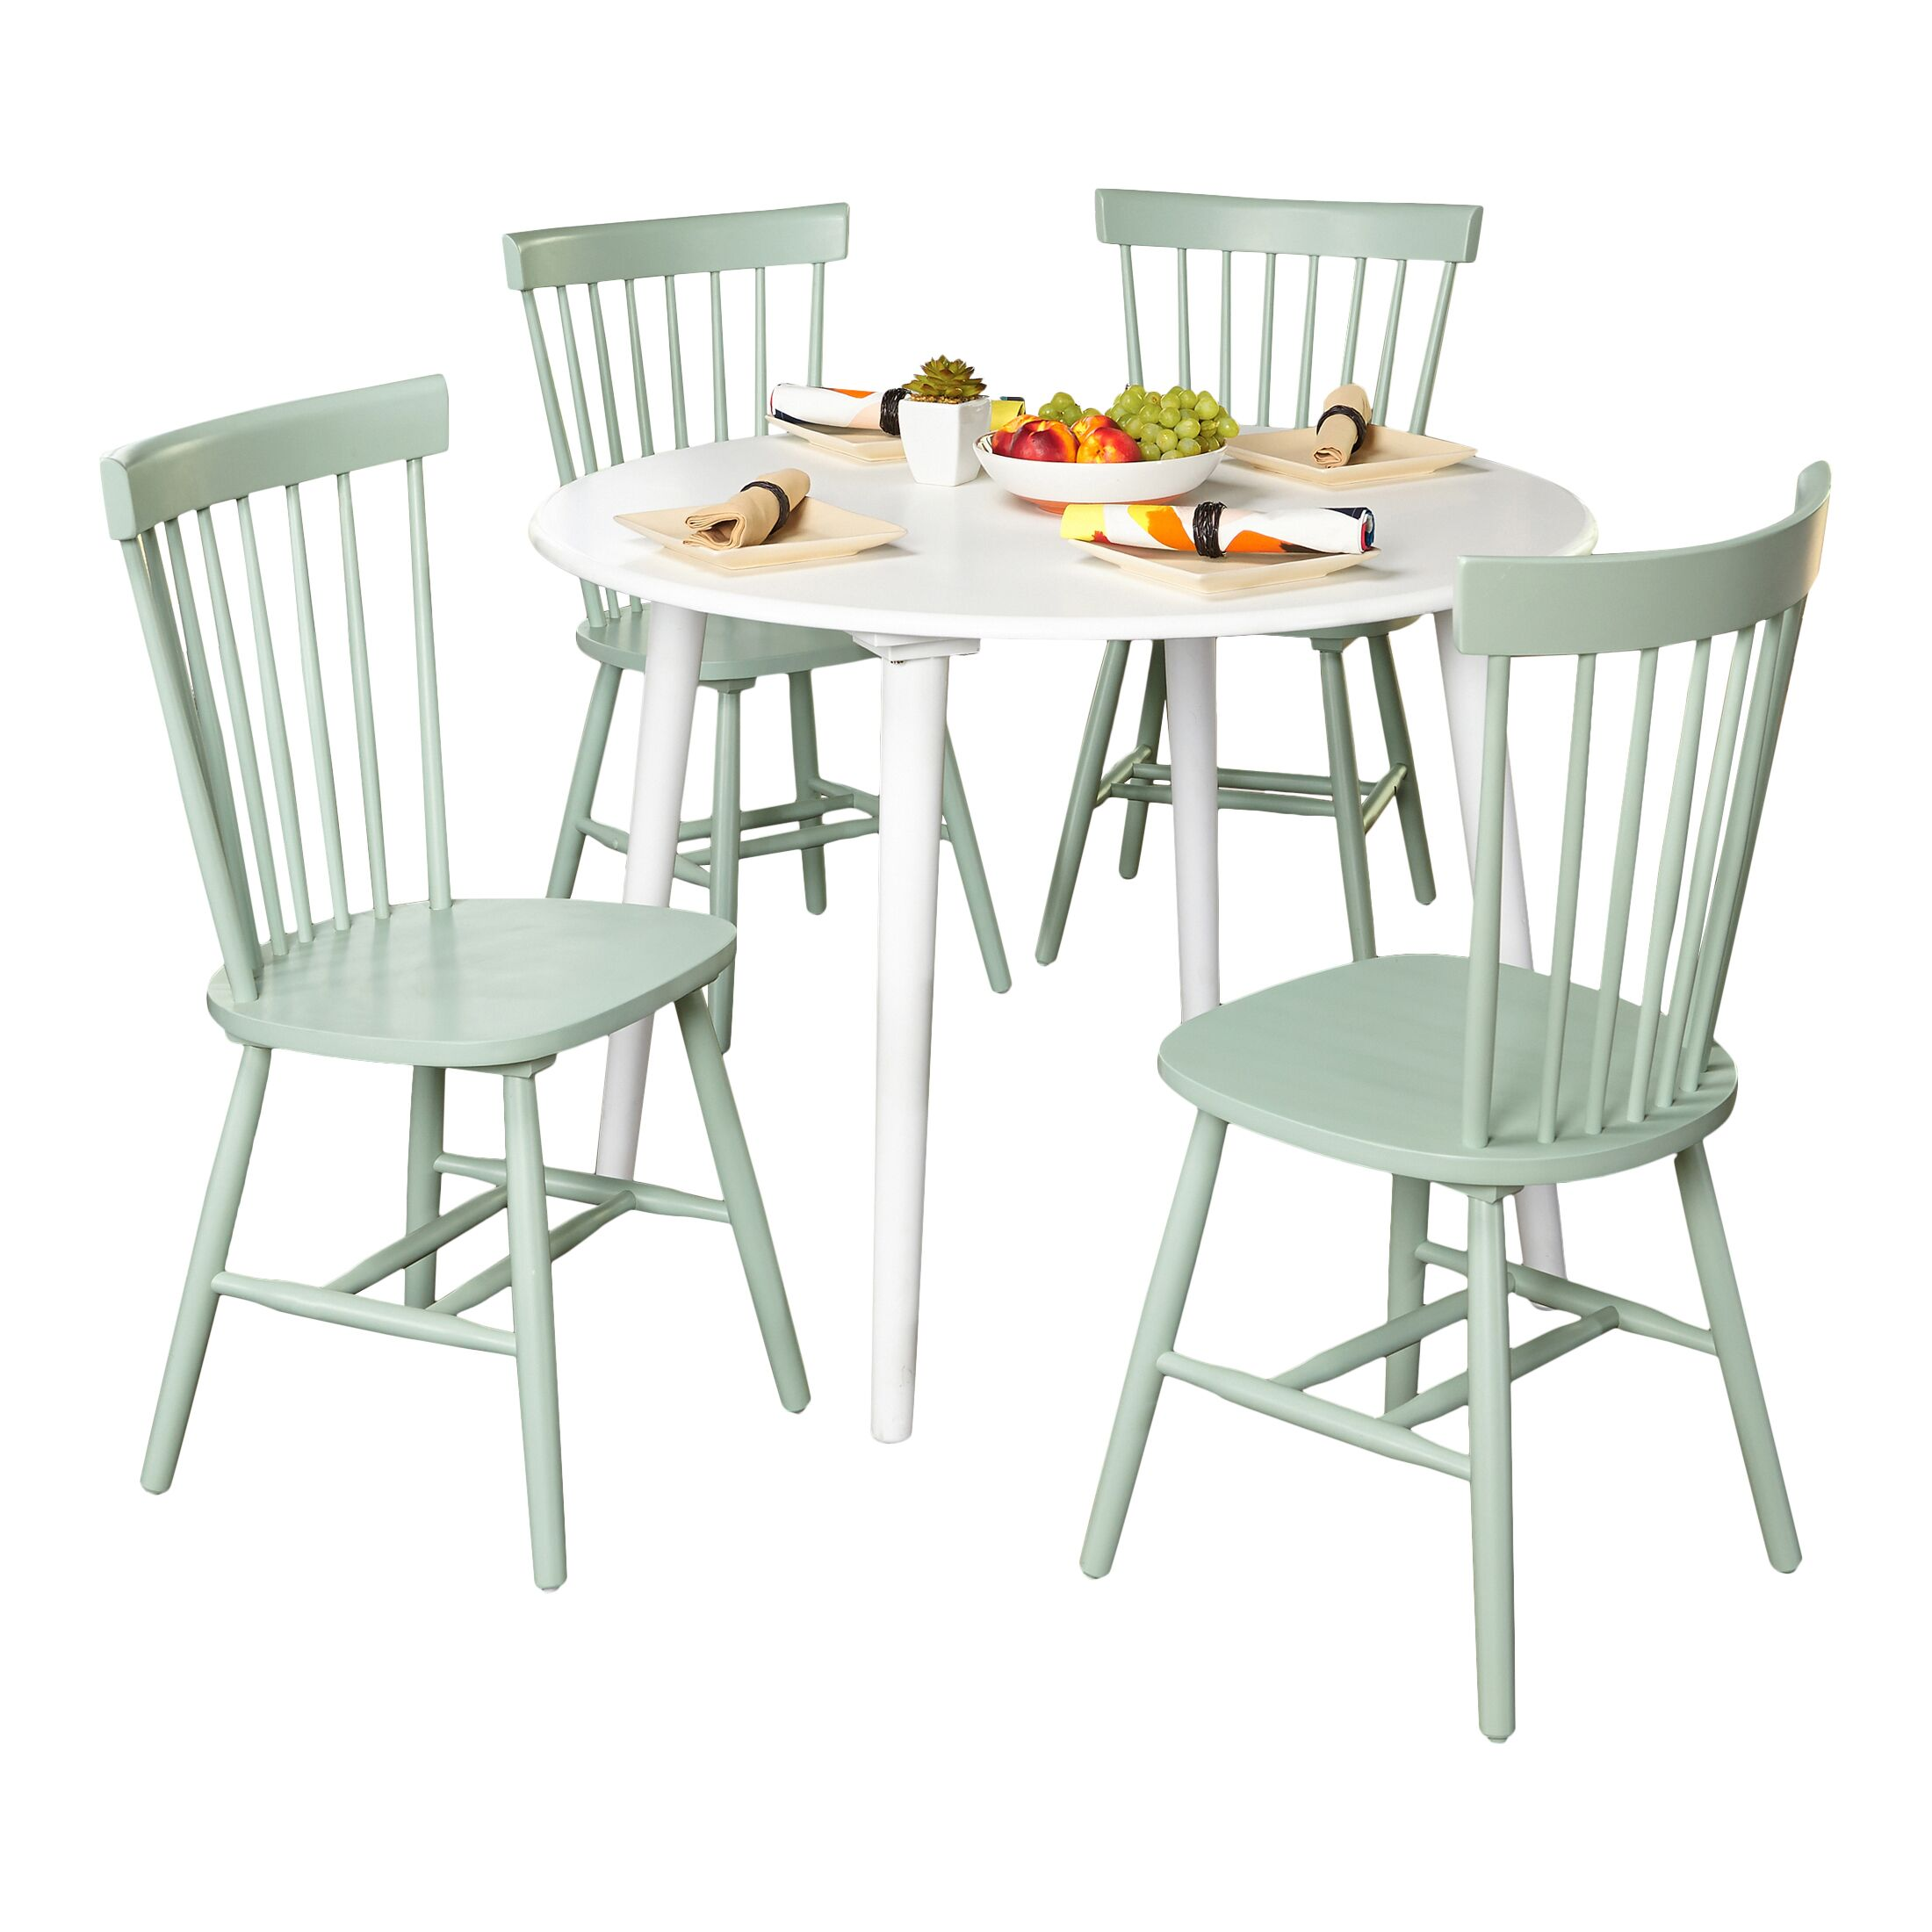 Vanessa 5 Piece Dining Set Chair Finish: Mint